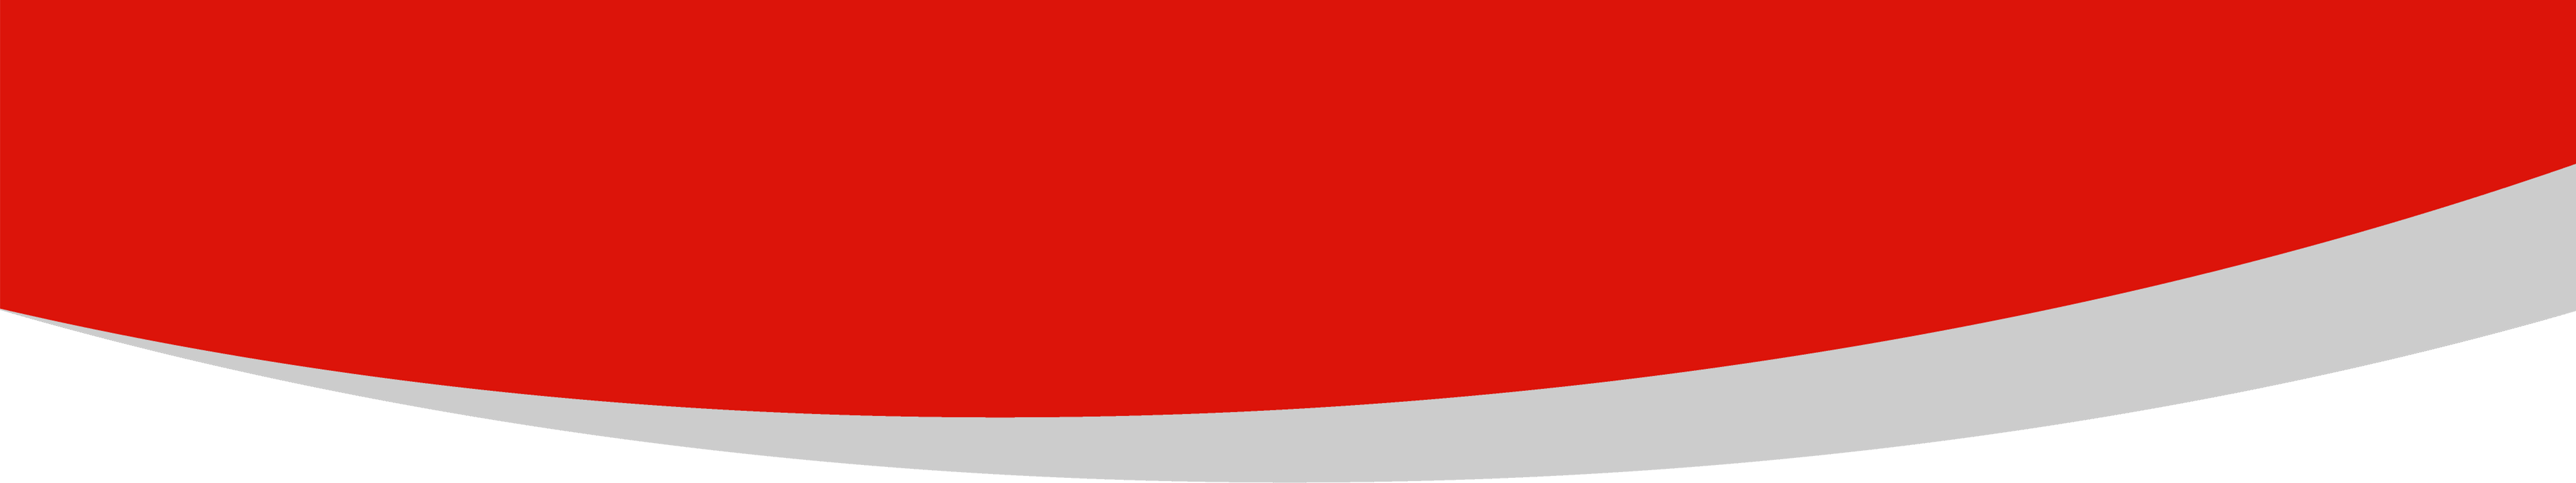 carousel curve